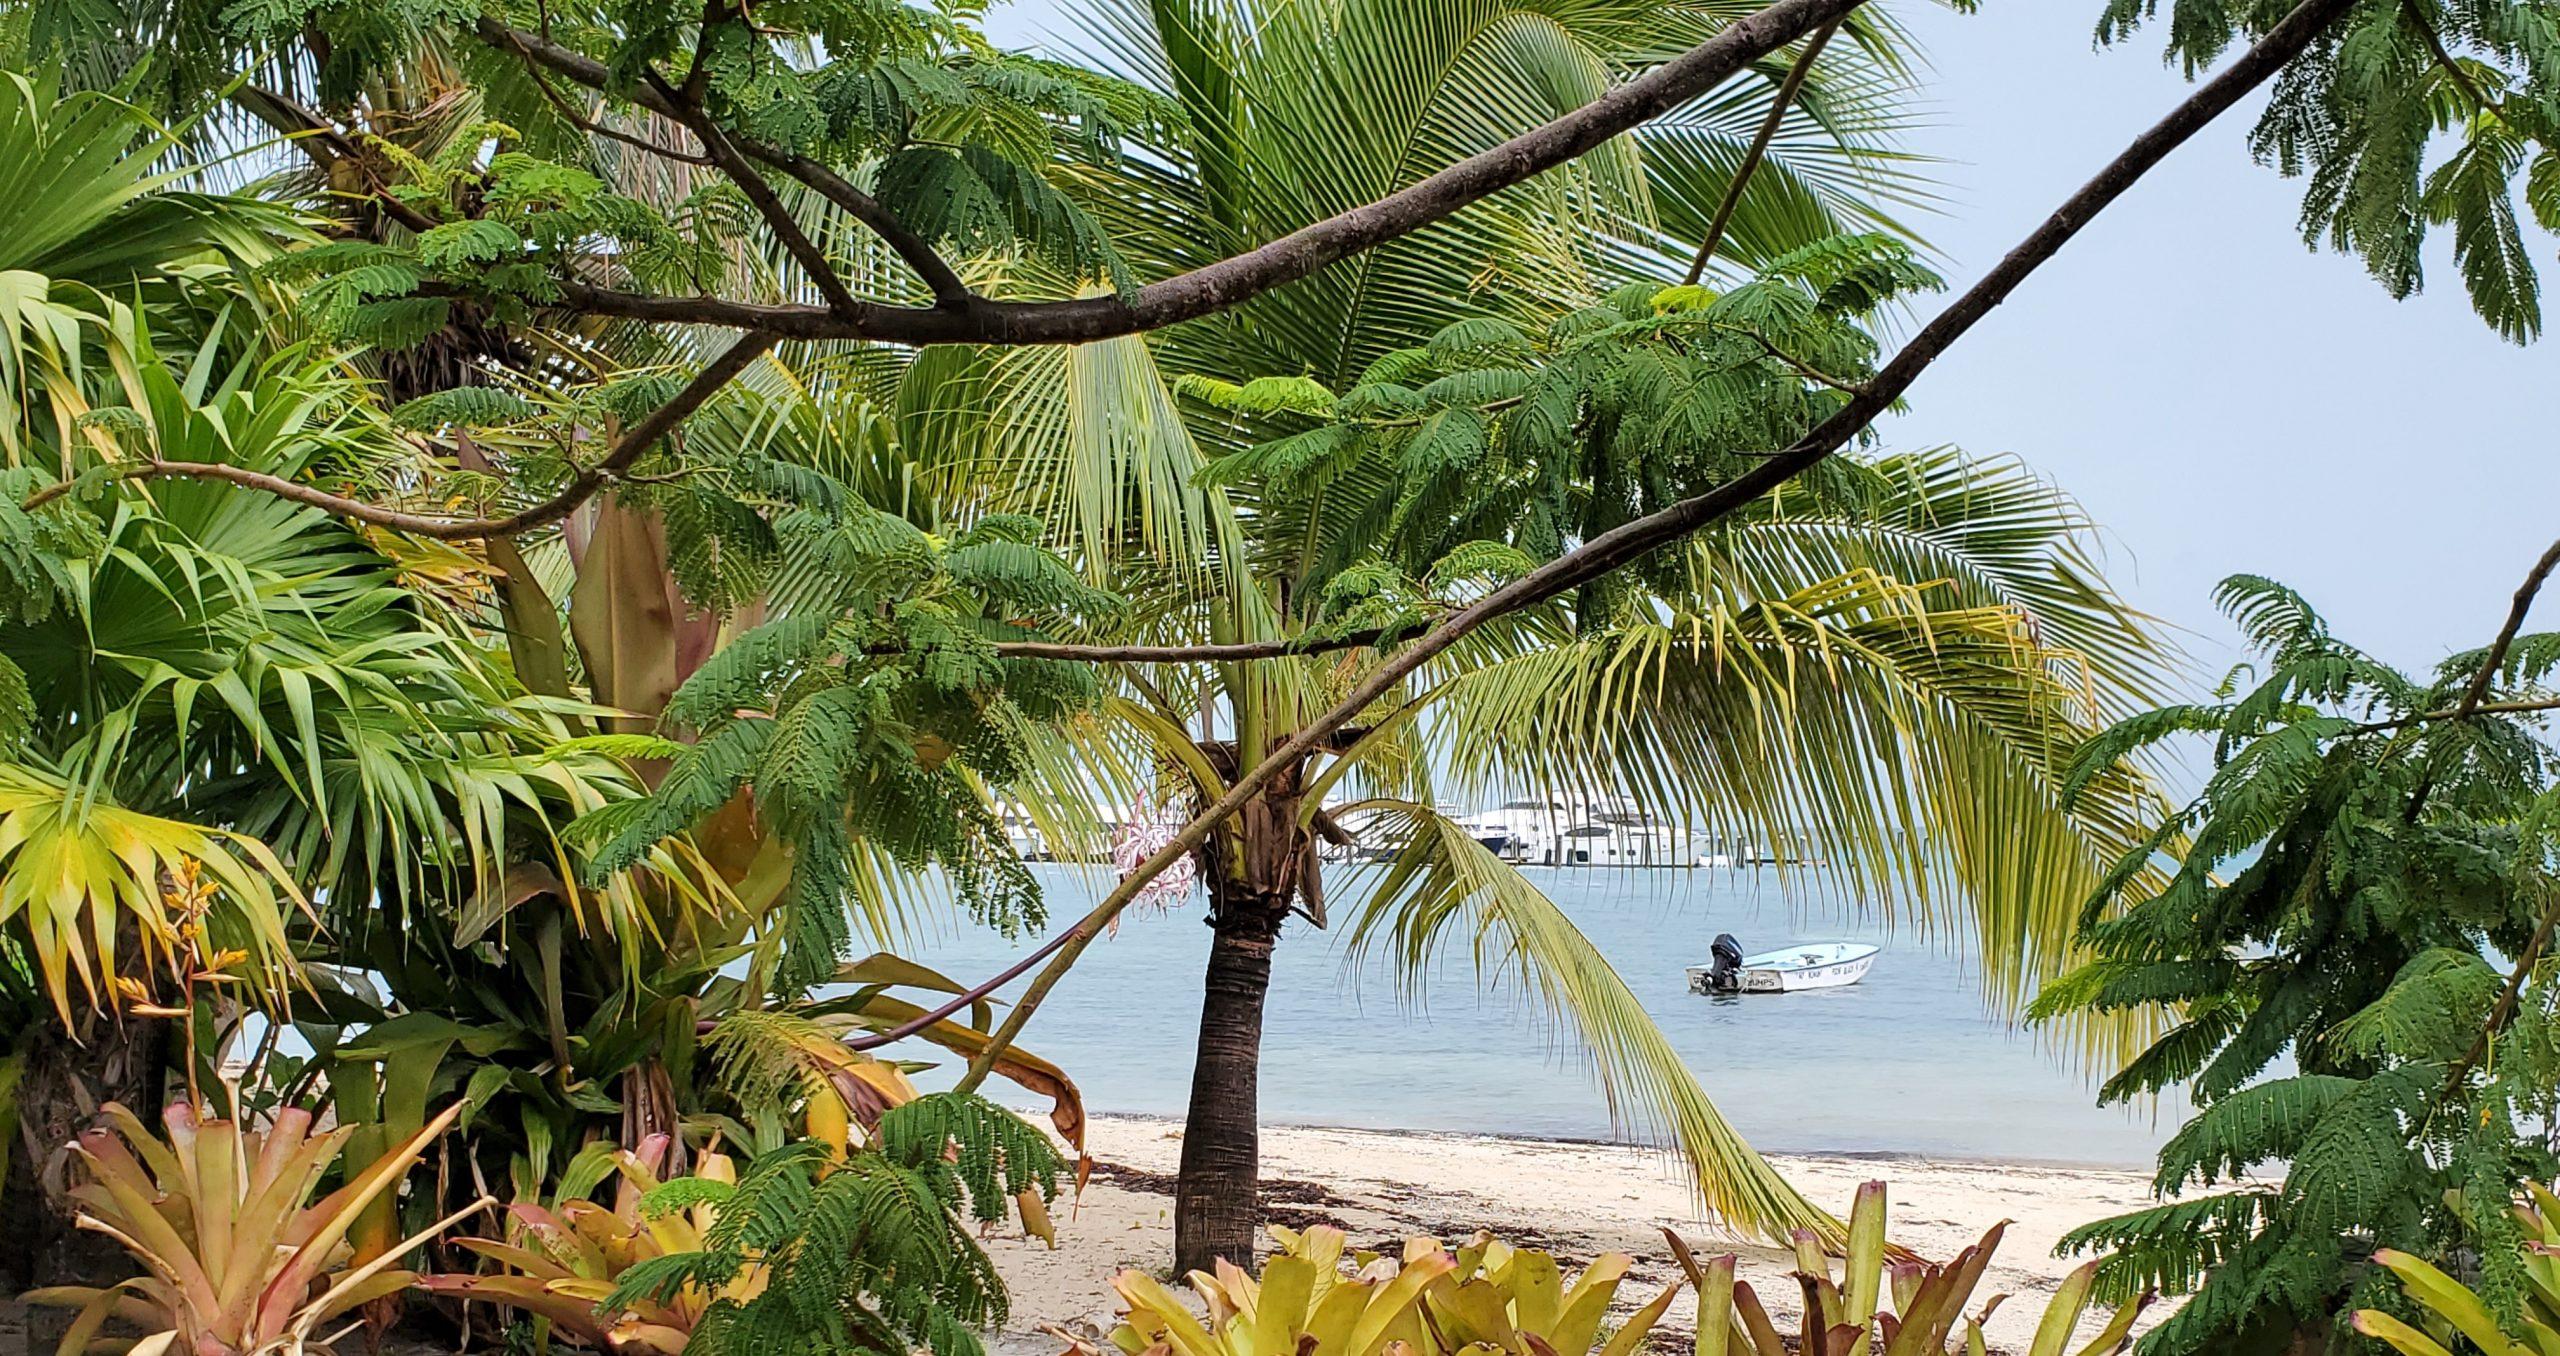 07-2021 Briland Club Marina Beach Looking at Vessels